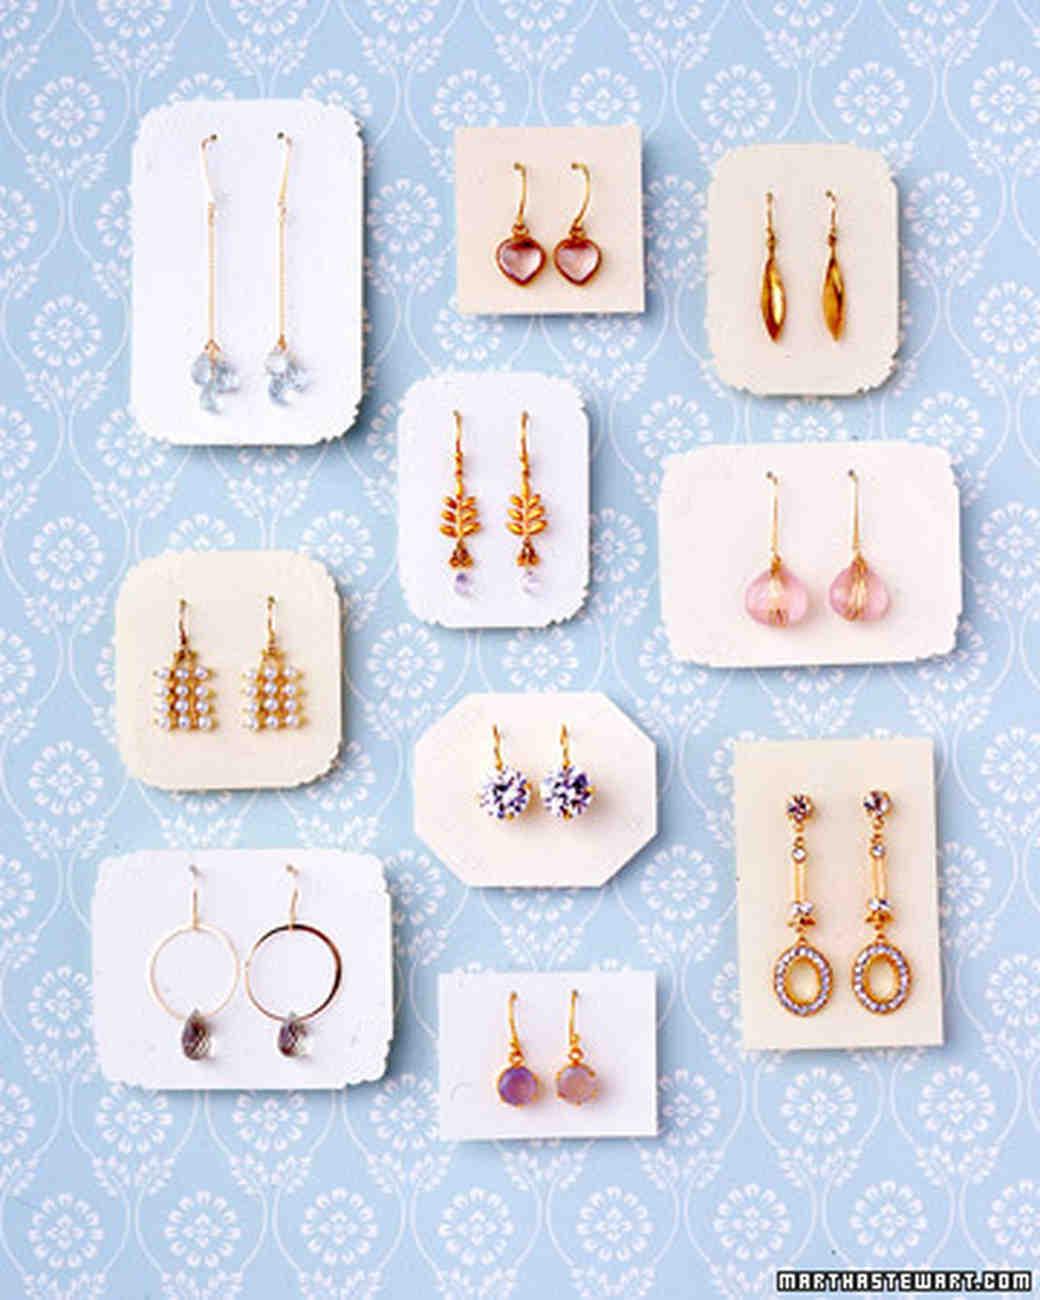 From the Market: Earrings